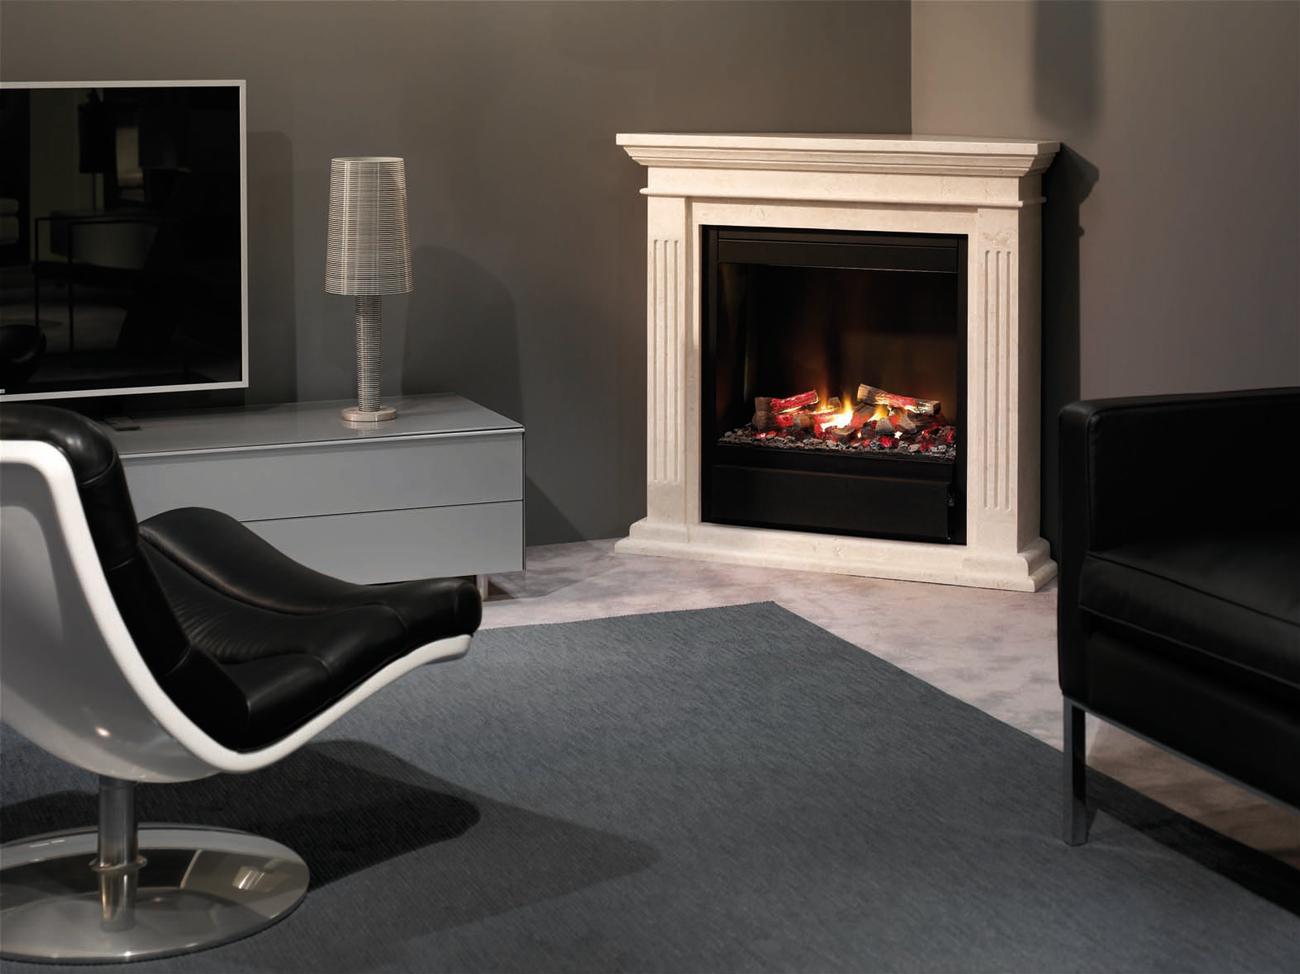 ruby fires cadiz elektro eckkamin. Black Bedroom Furniture Sets. Home Design Ideas